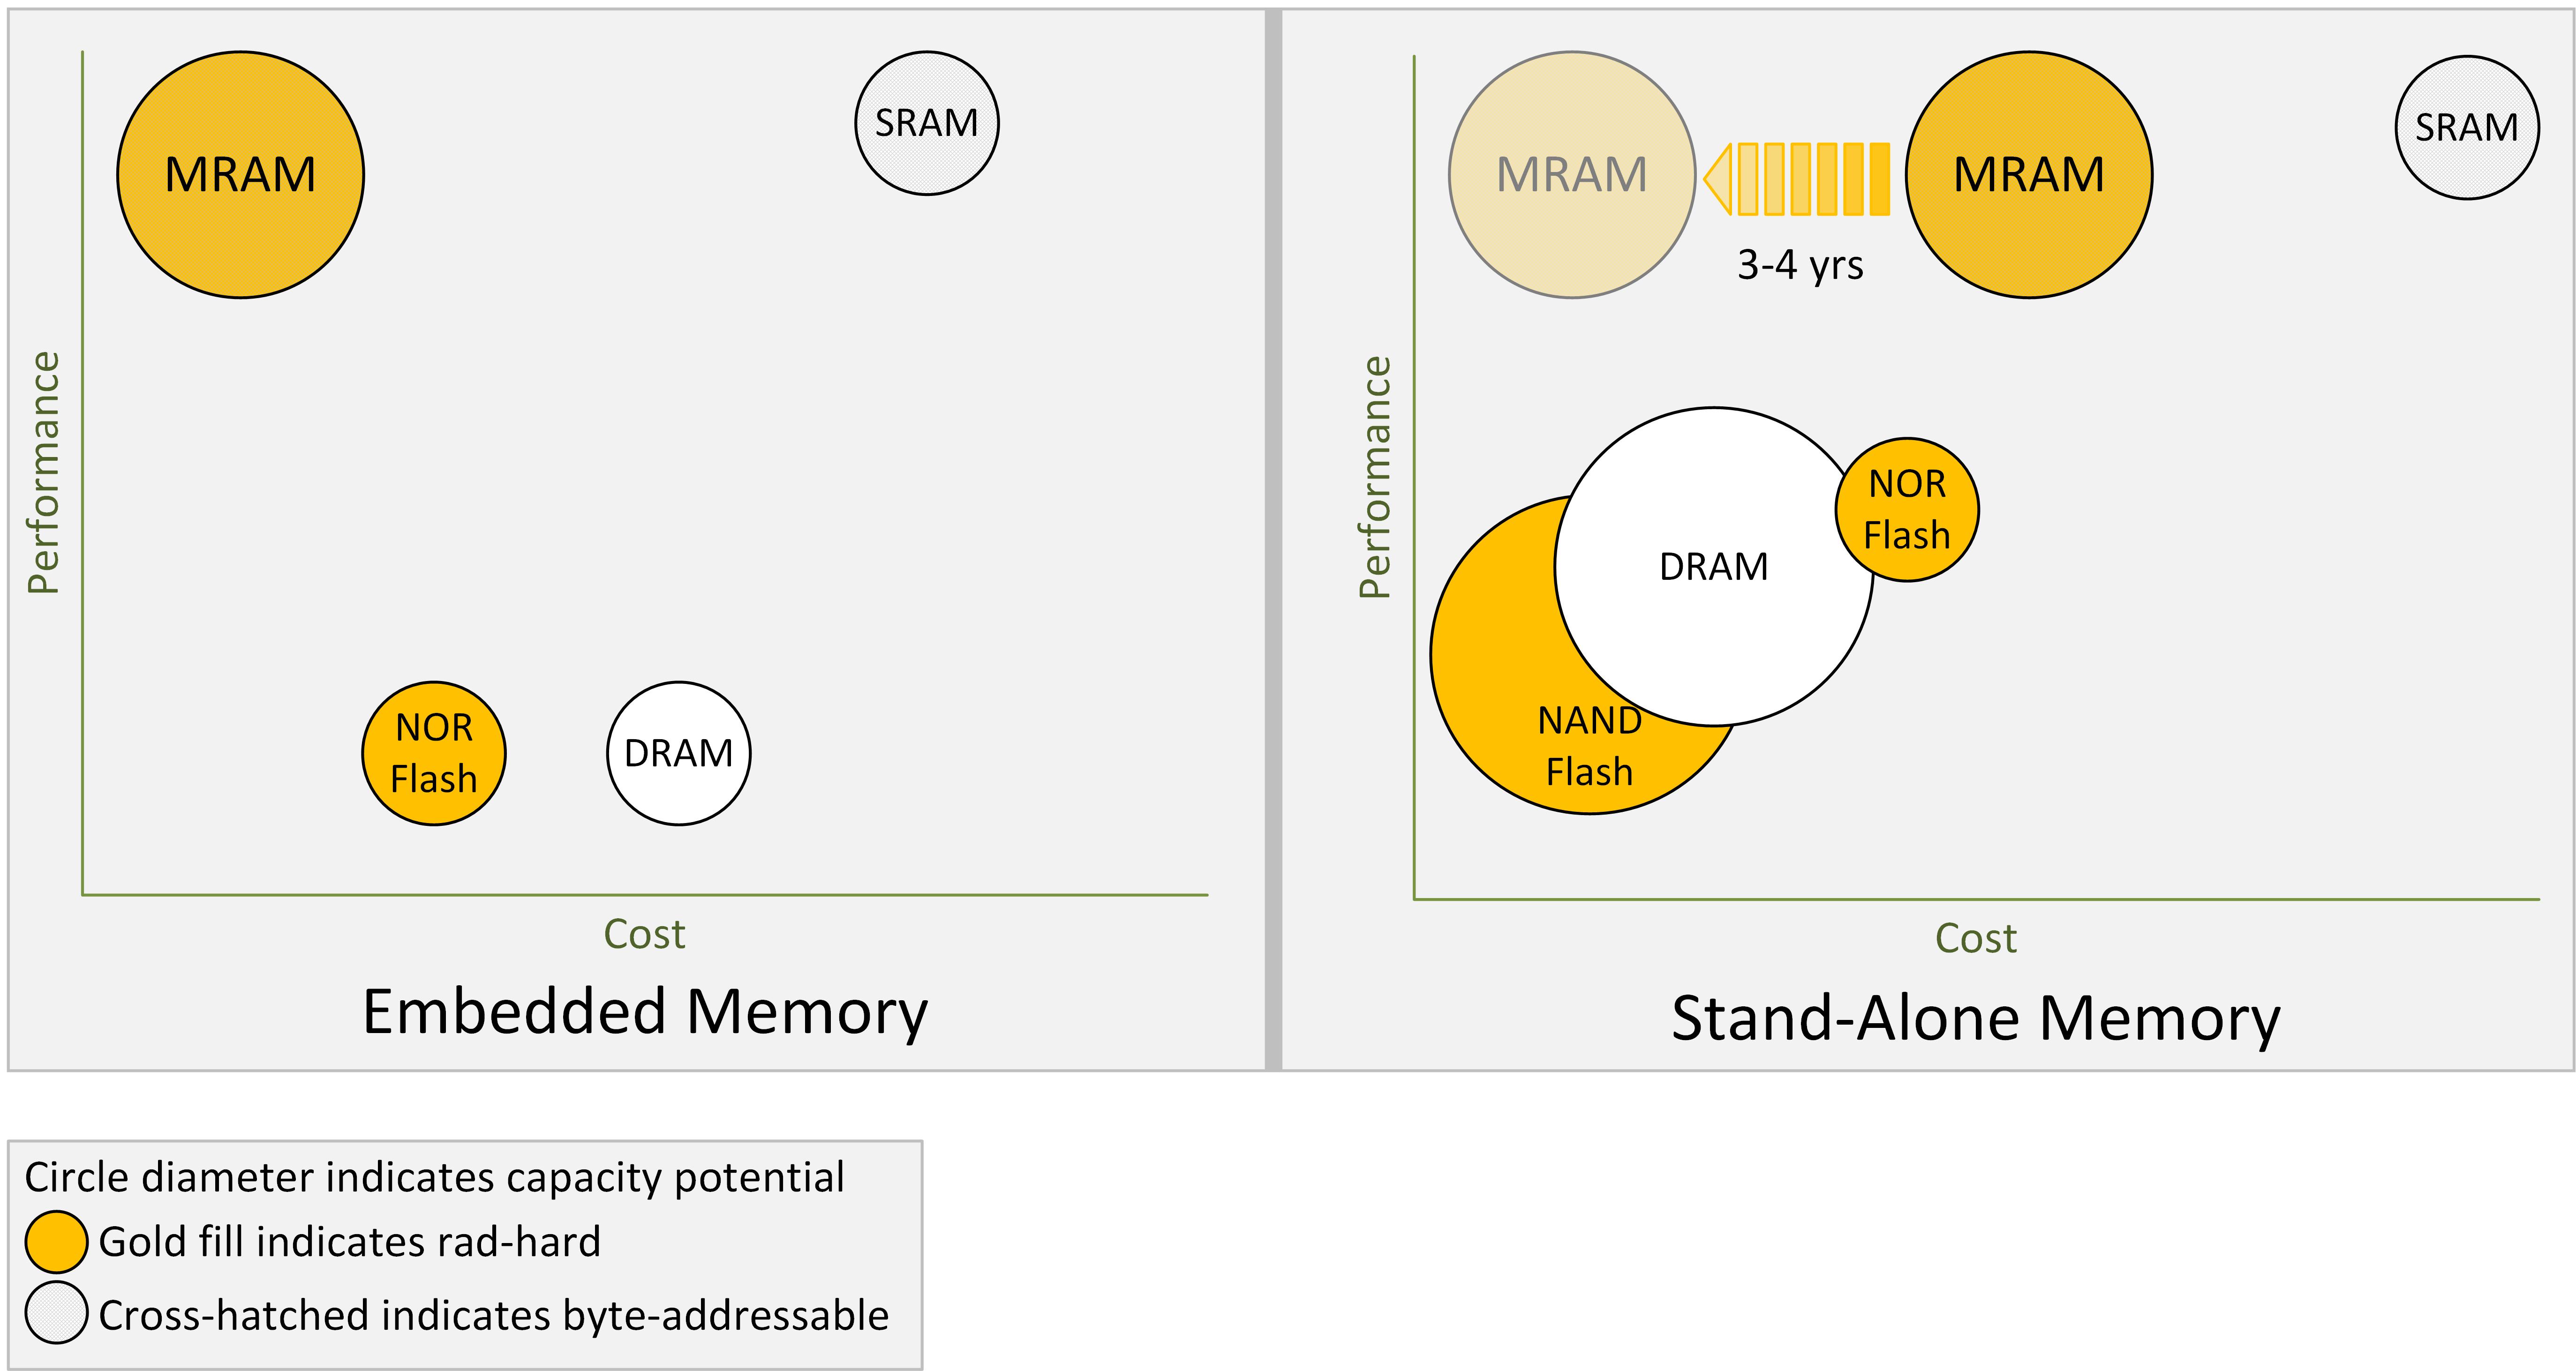 MRAM overcomes SRAM, DRAM, and flash limitations | ITProPortal